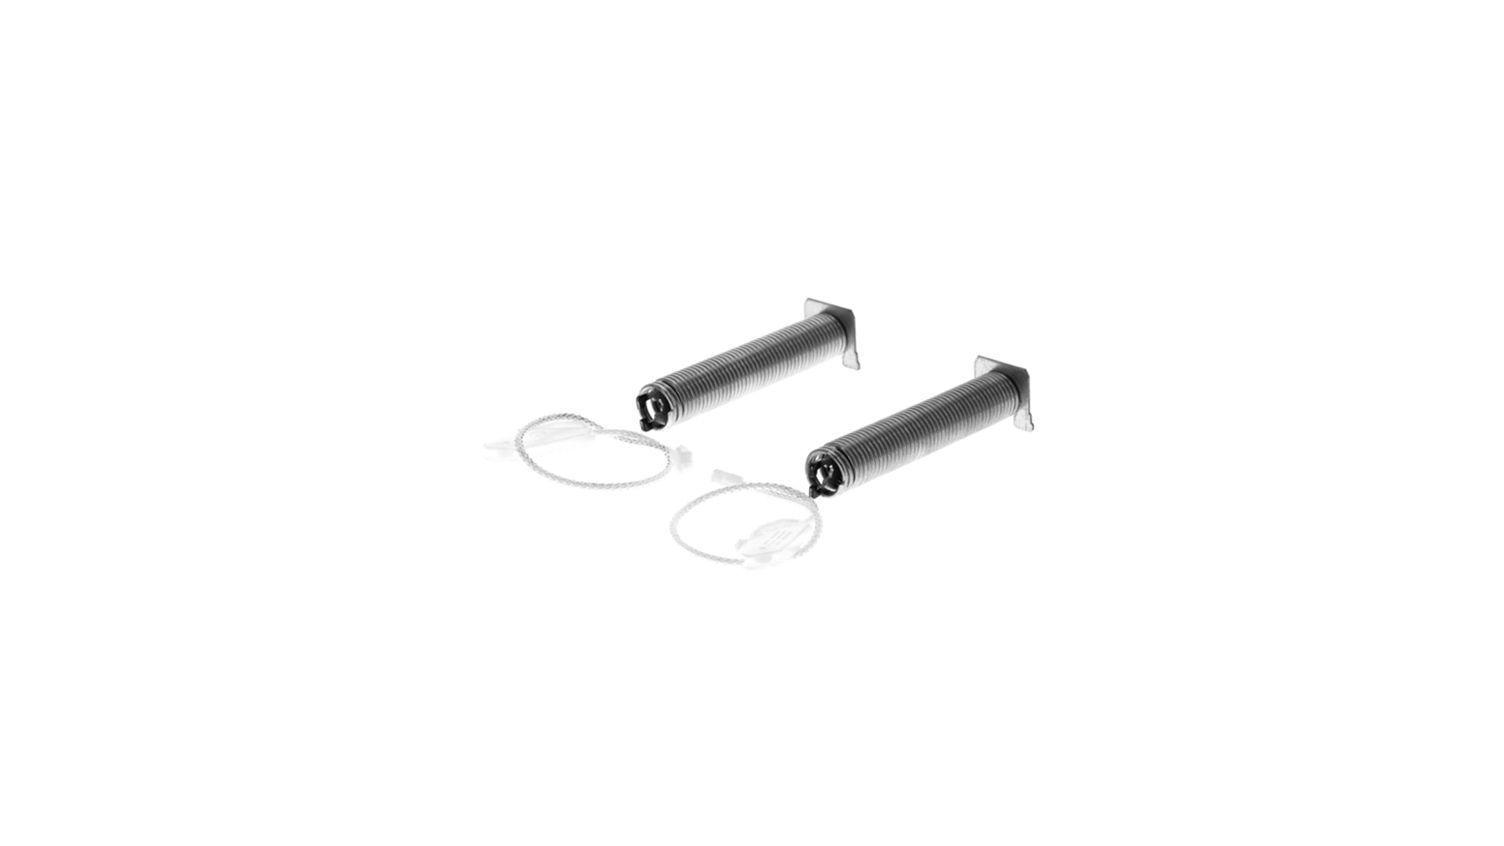 Repair Set, 2 Springs, 2 Cords for Bosch Siemens Dishwashers - Part nr. BSH 00754869 BSH - Bosch / Siemens